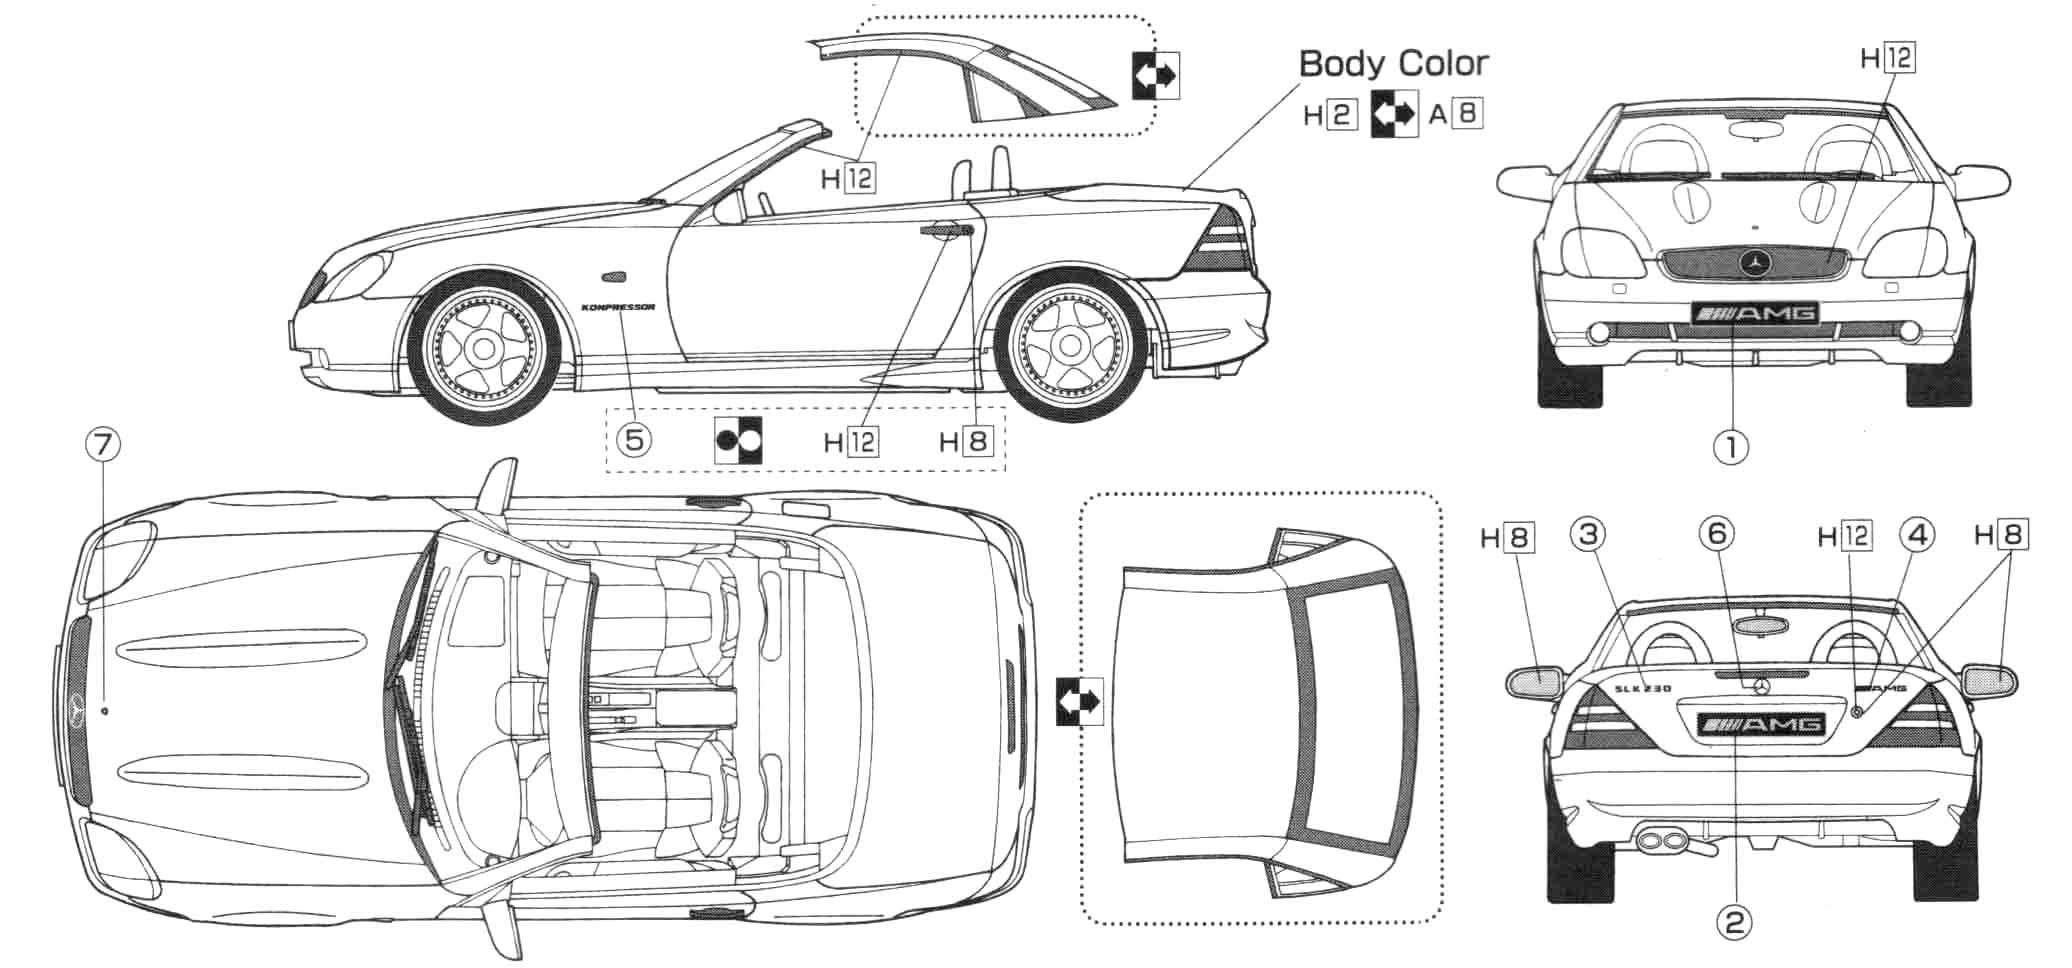 Car blueprint | Blueprints - Cars | Pinterest | Cars and Car stuff